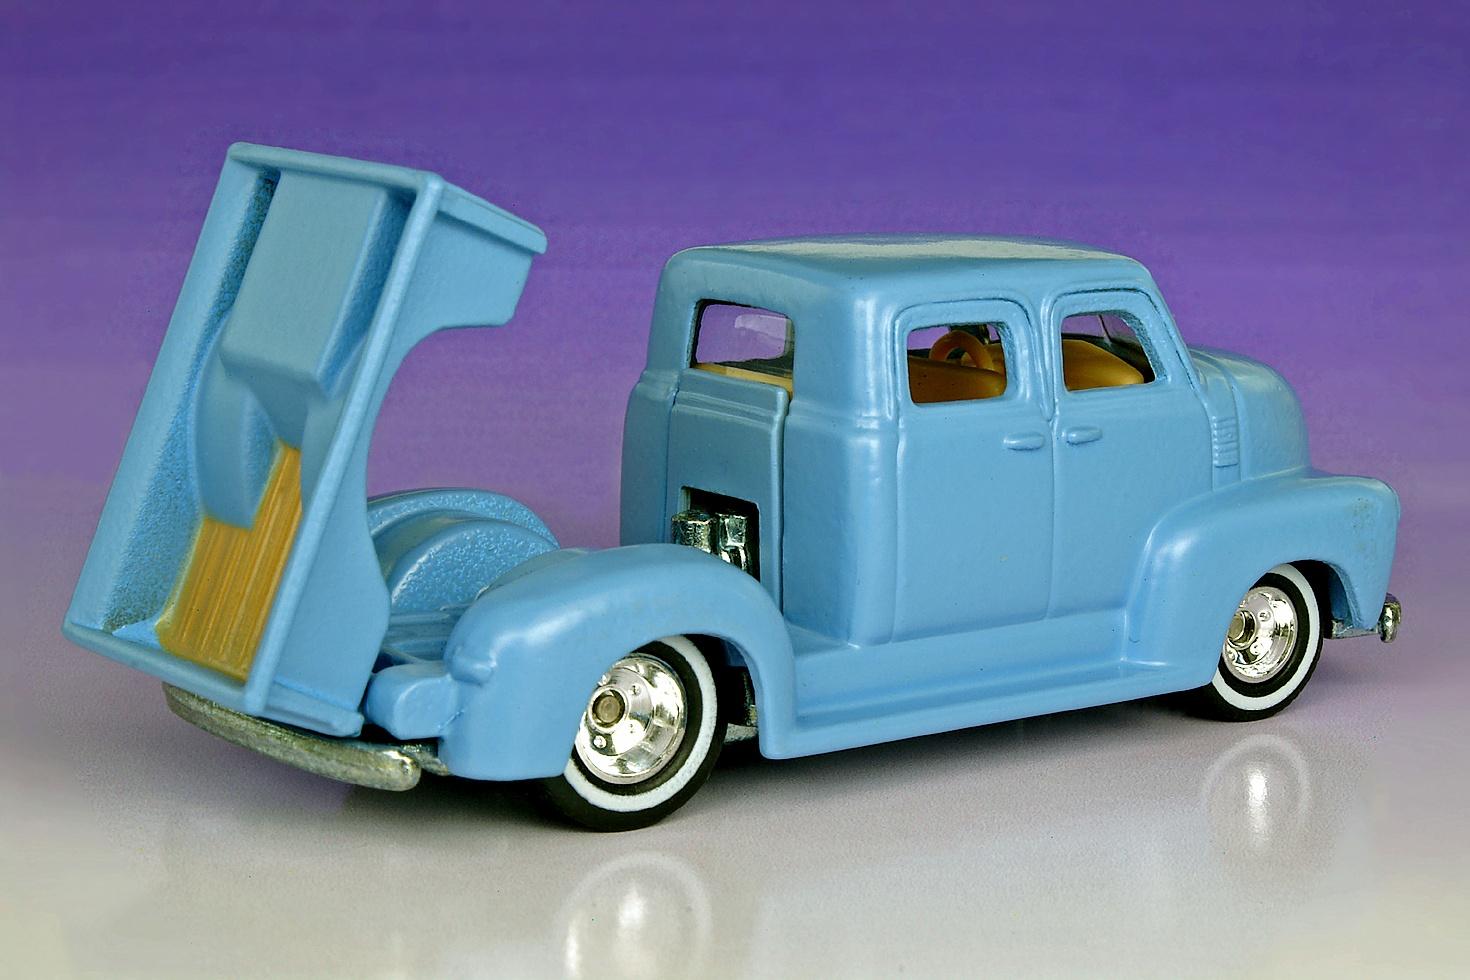 1950 Chevy Truck Model Kit For Sale